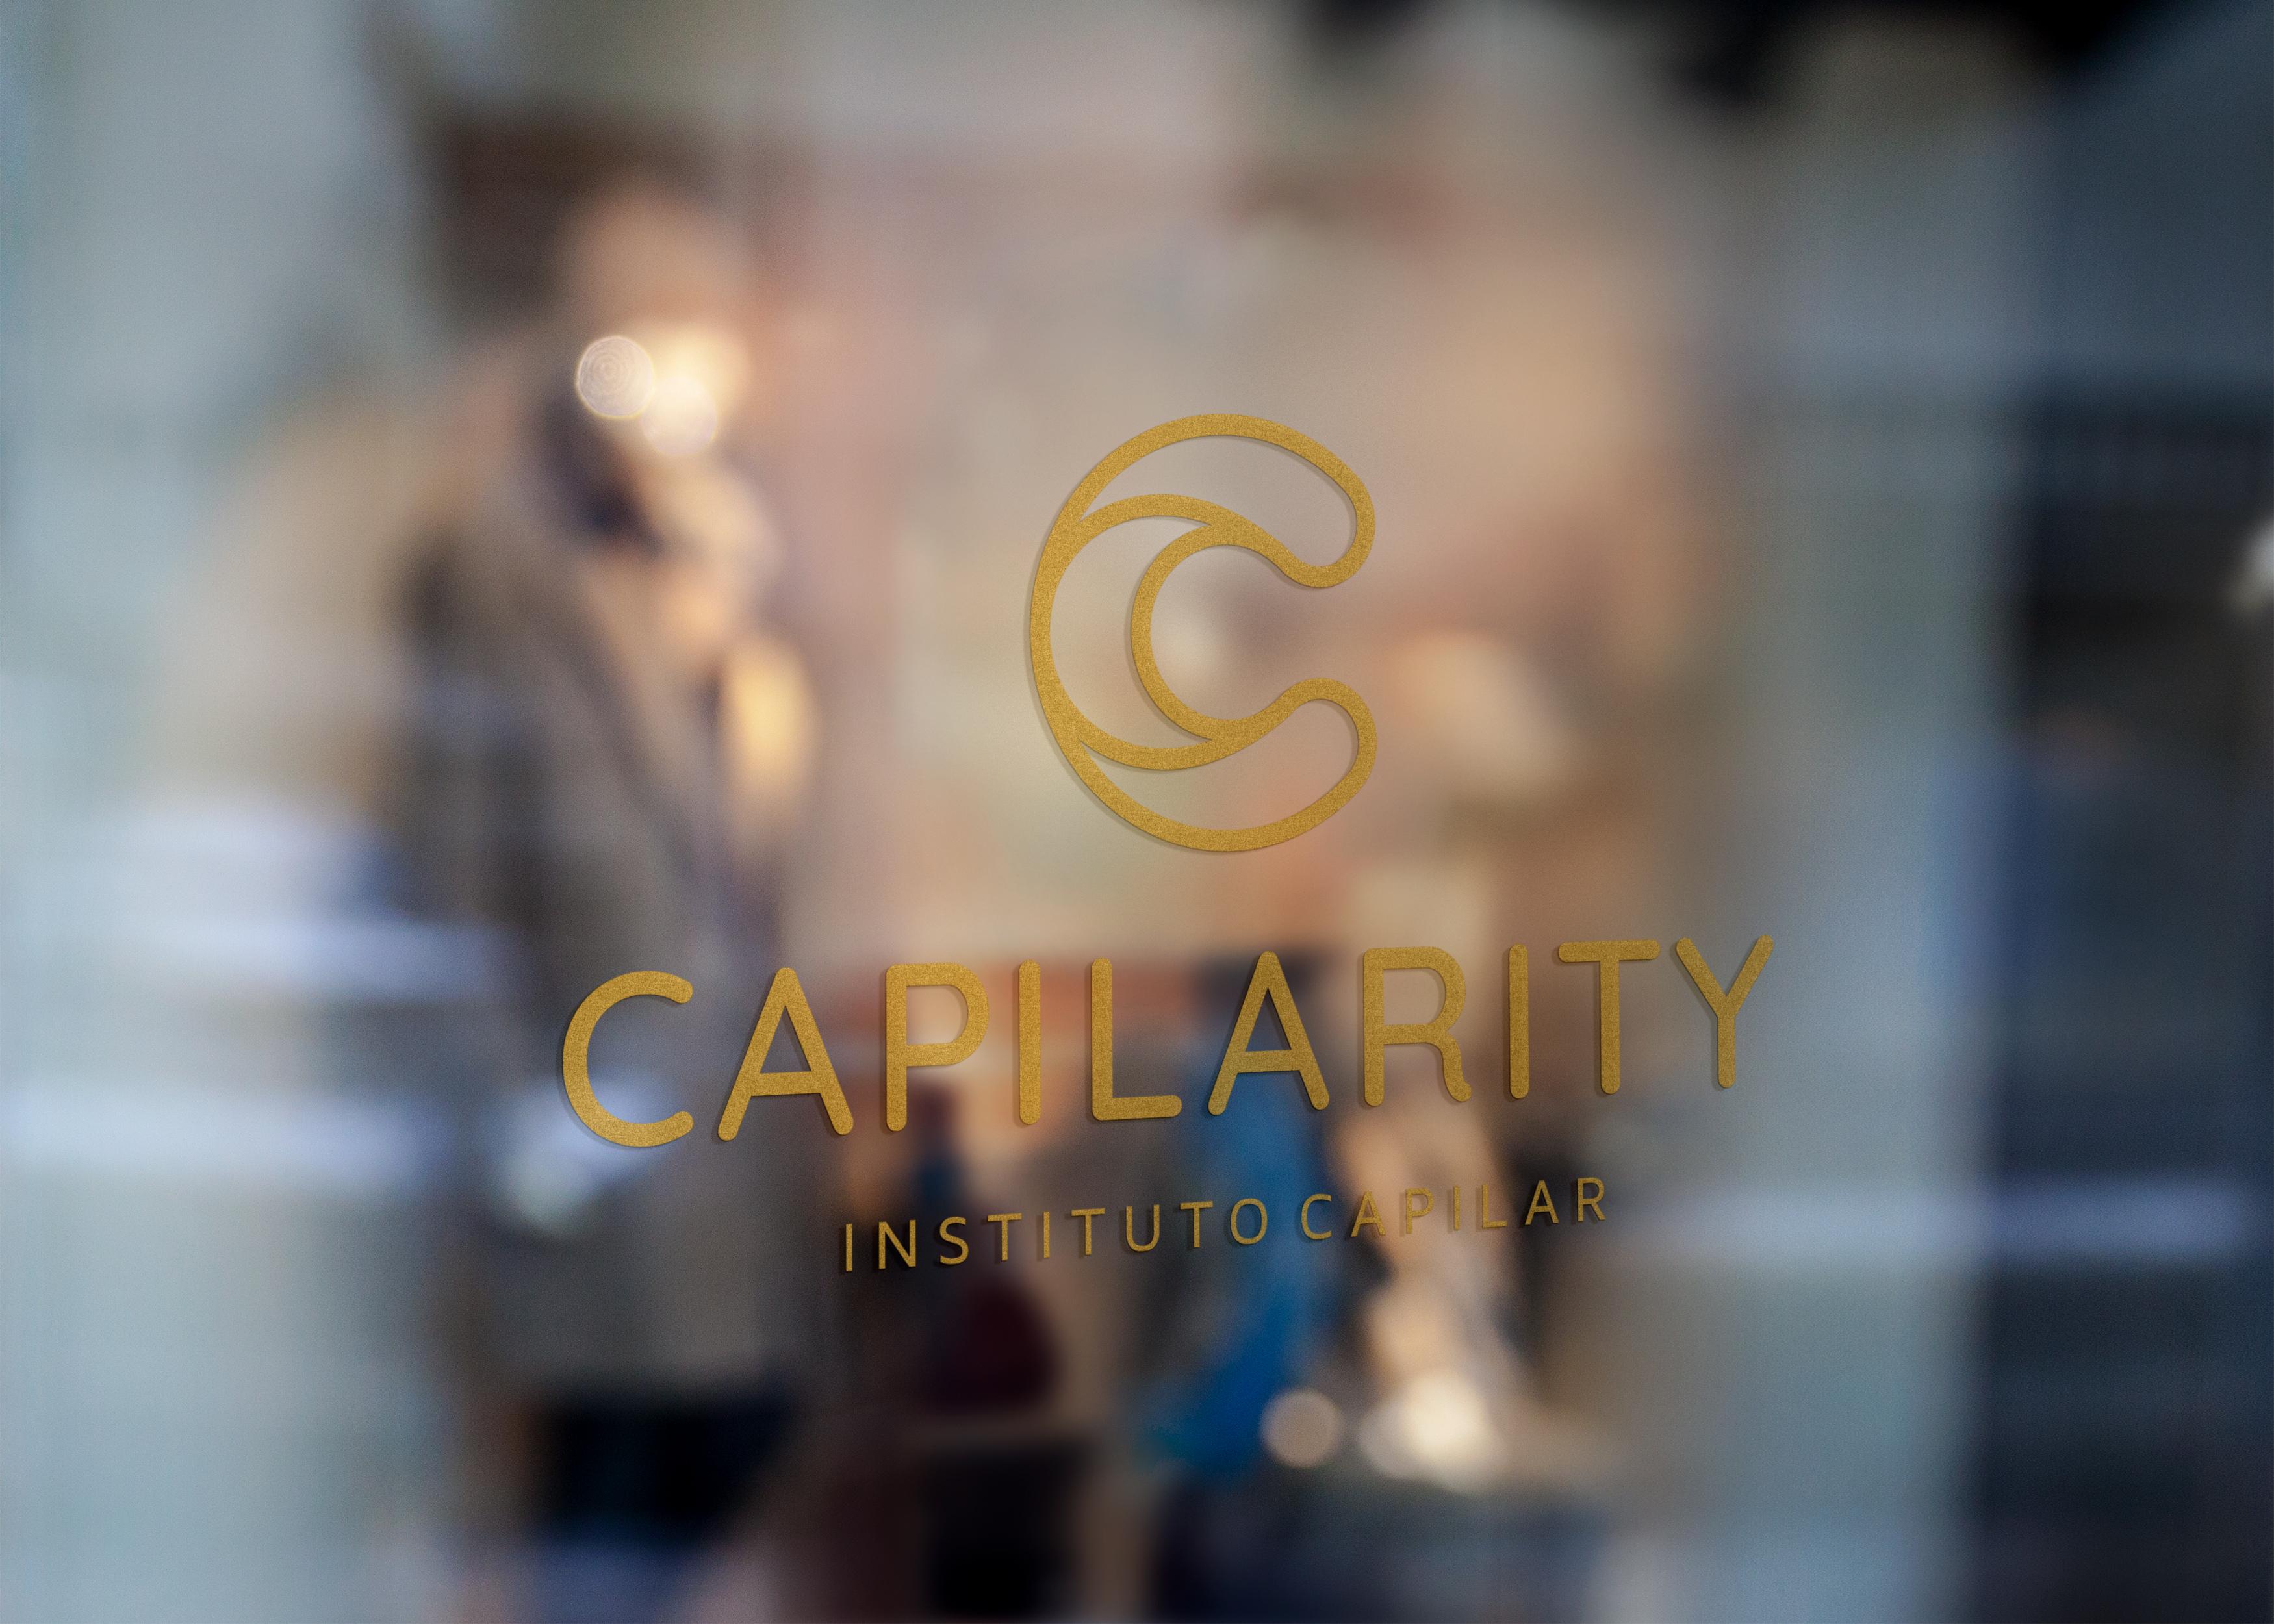 CAPILARITY